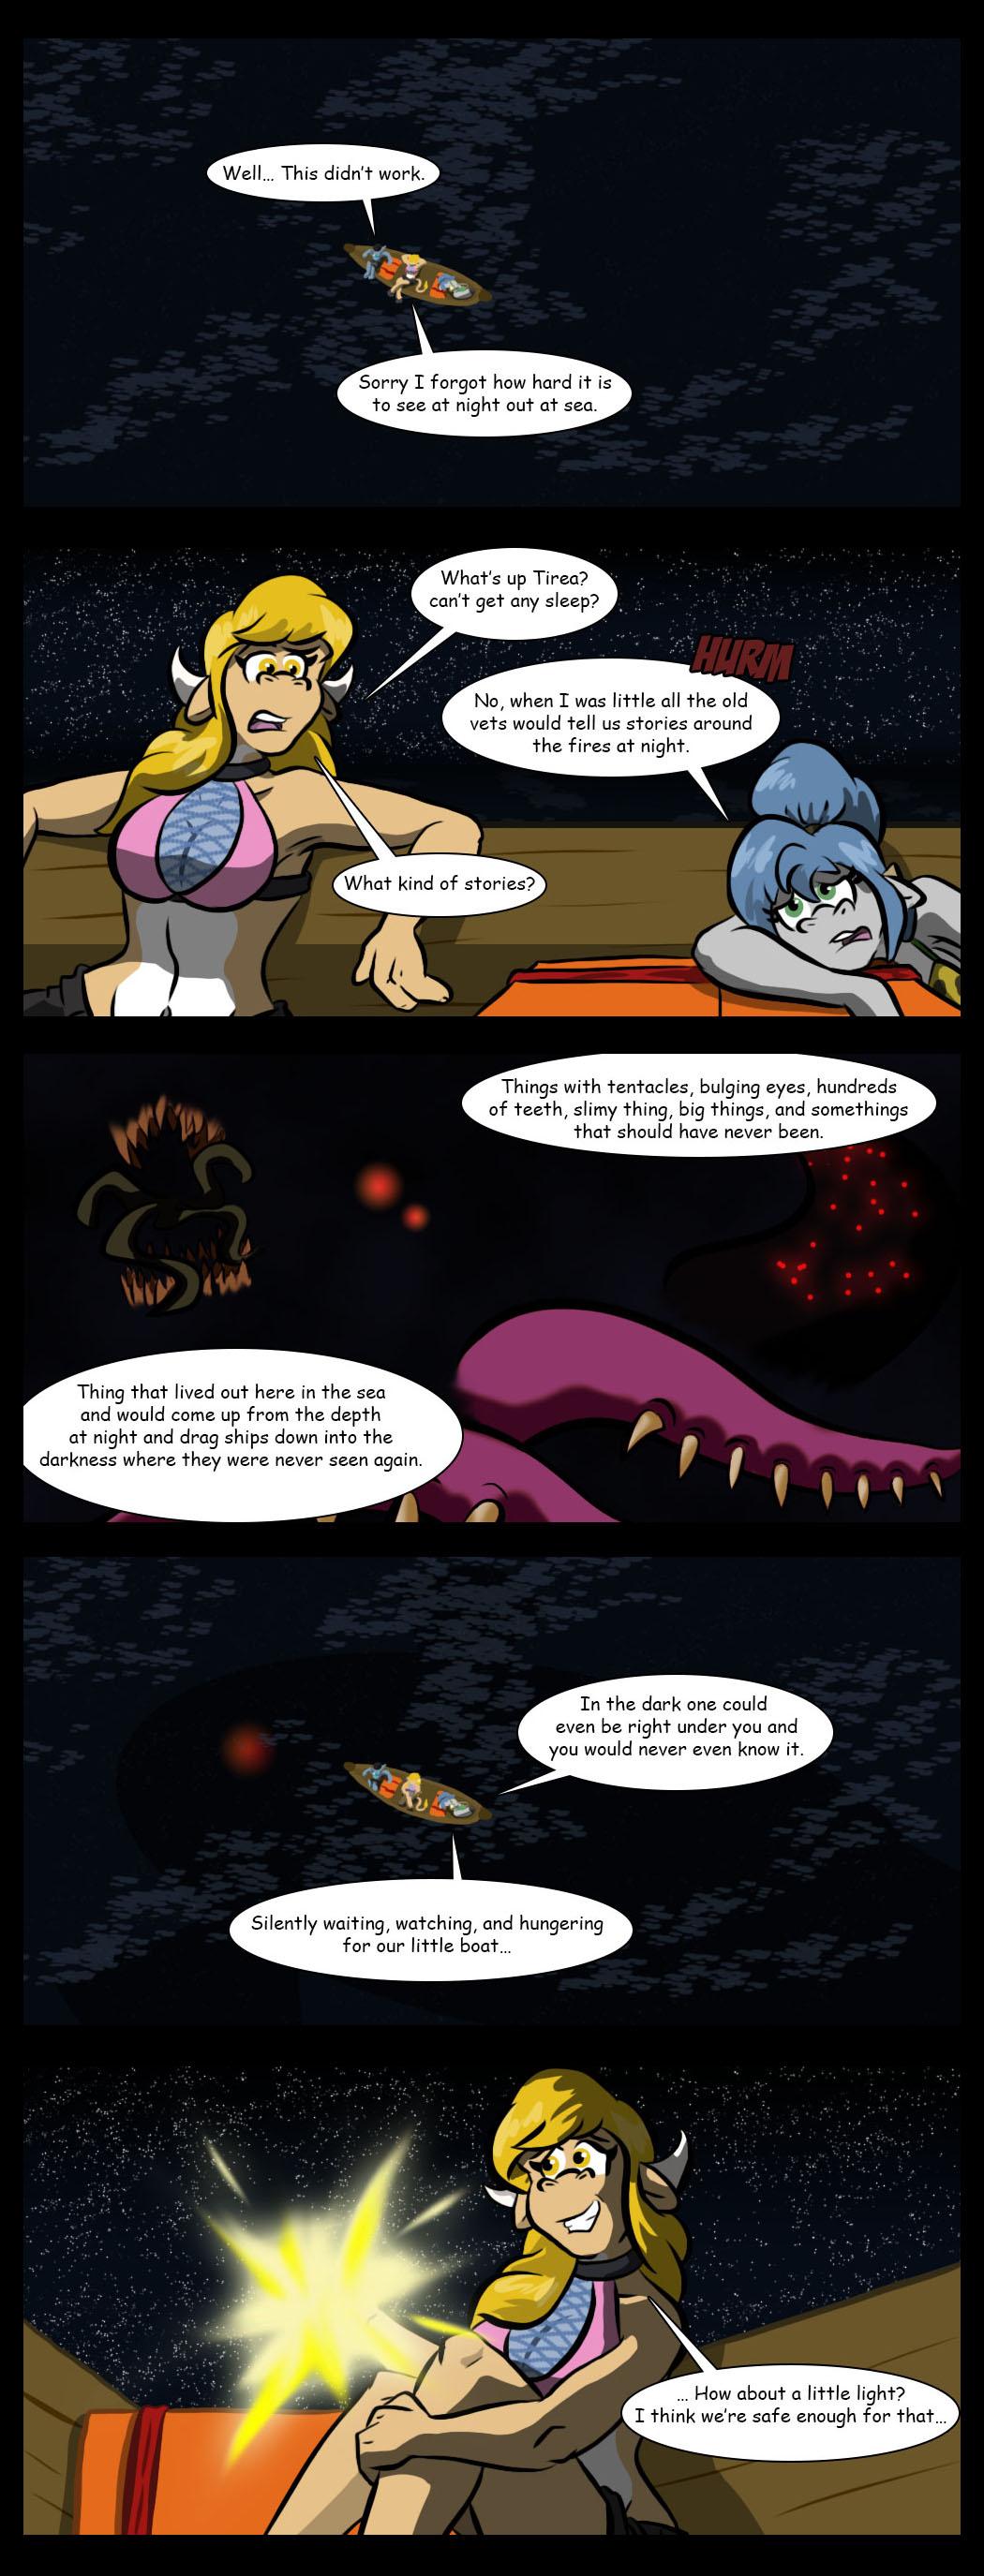 Things in the deep